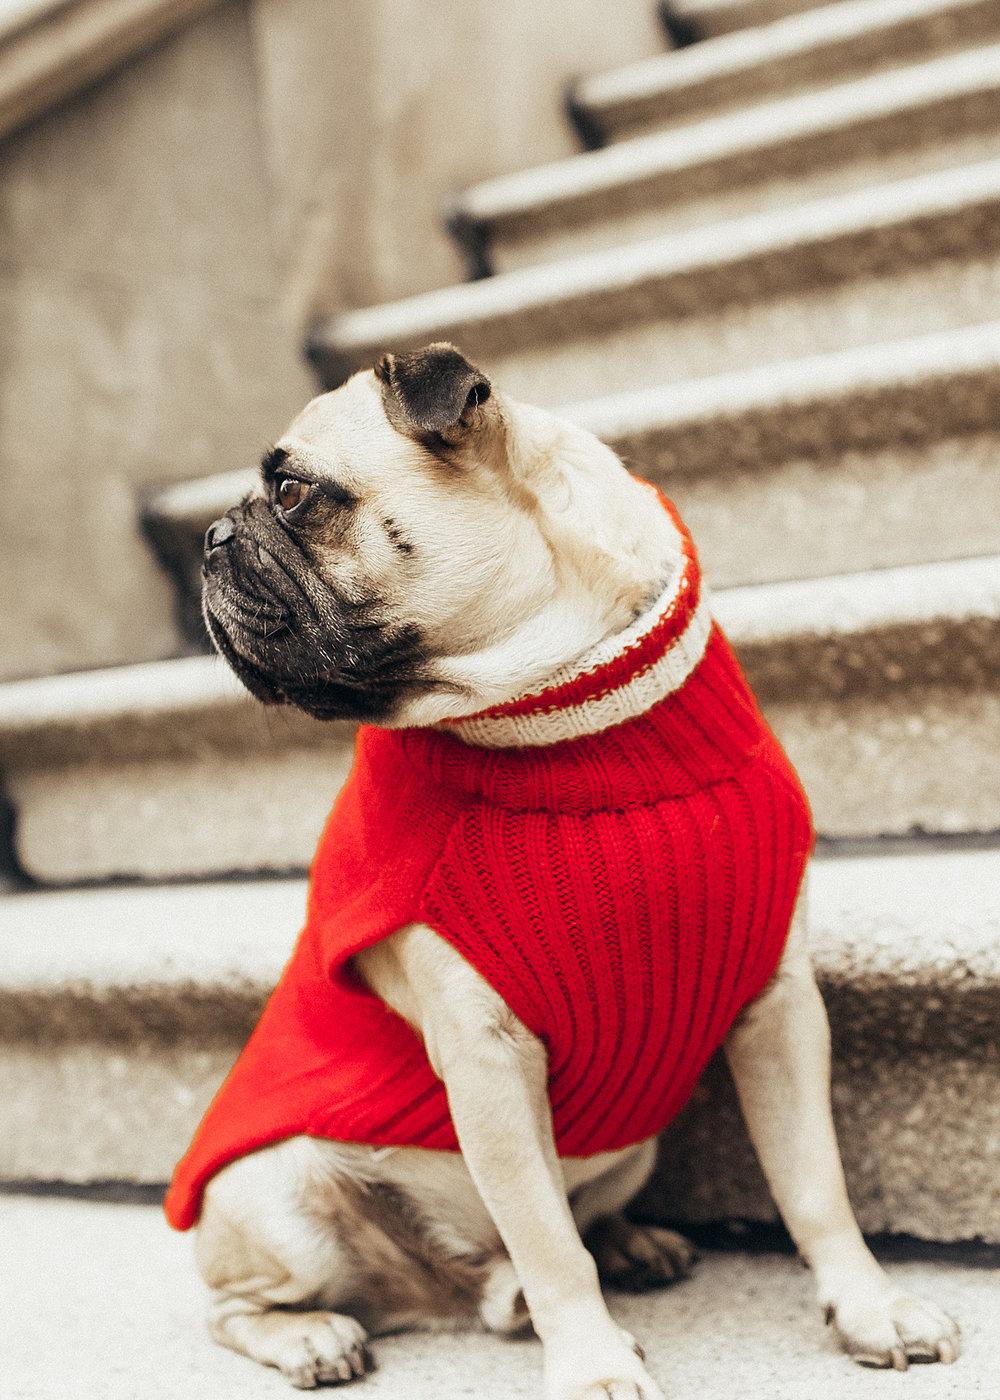 honeyidressedthepug-ariandm-dogfashionblog-petfashionblog-humanandhoundfashion-twinning-humanandhoundmatching-dogmomstyle-fordogmoms-lifetstyleblog-dogfriendlyblog-fallfashion-newyorkcity-centralpark-puginclothes-dogmodel-pugmodel-dogblog 4.jpg